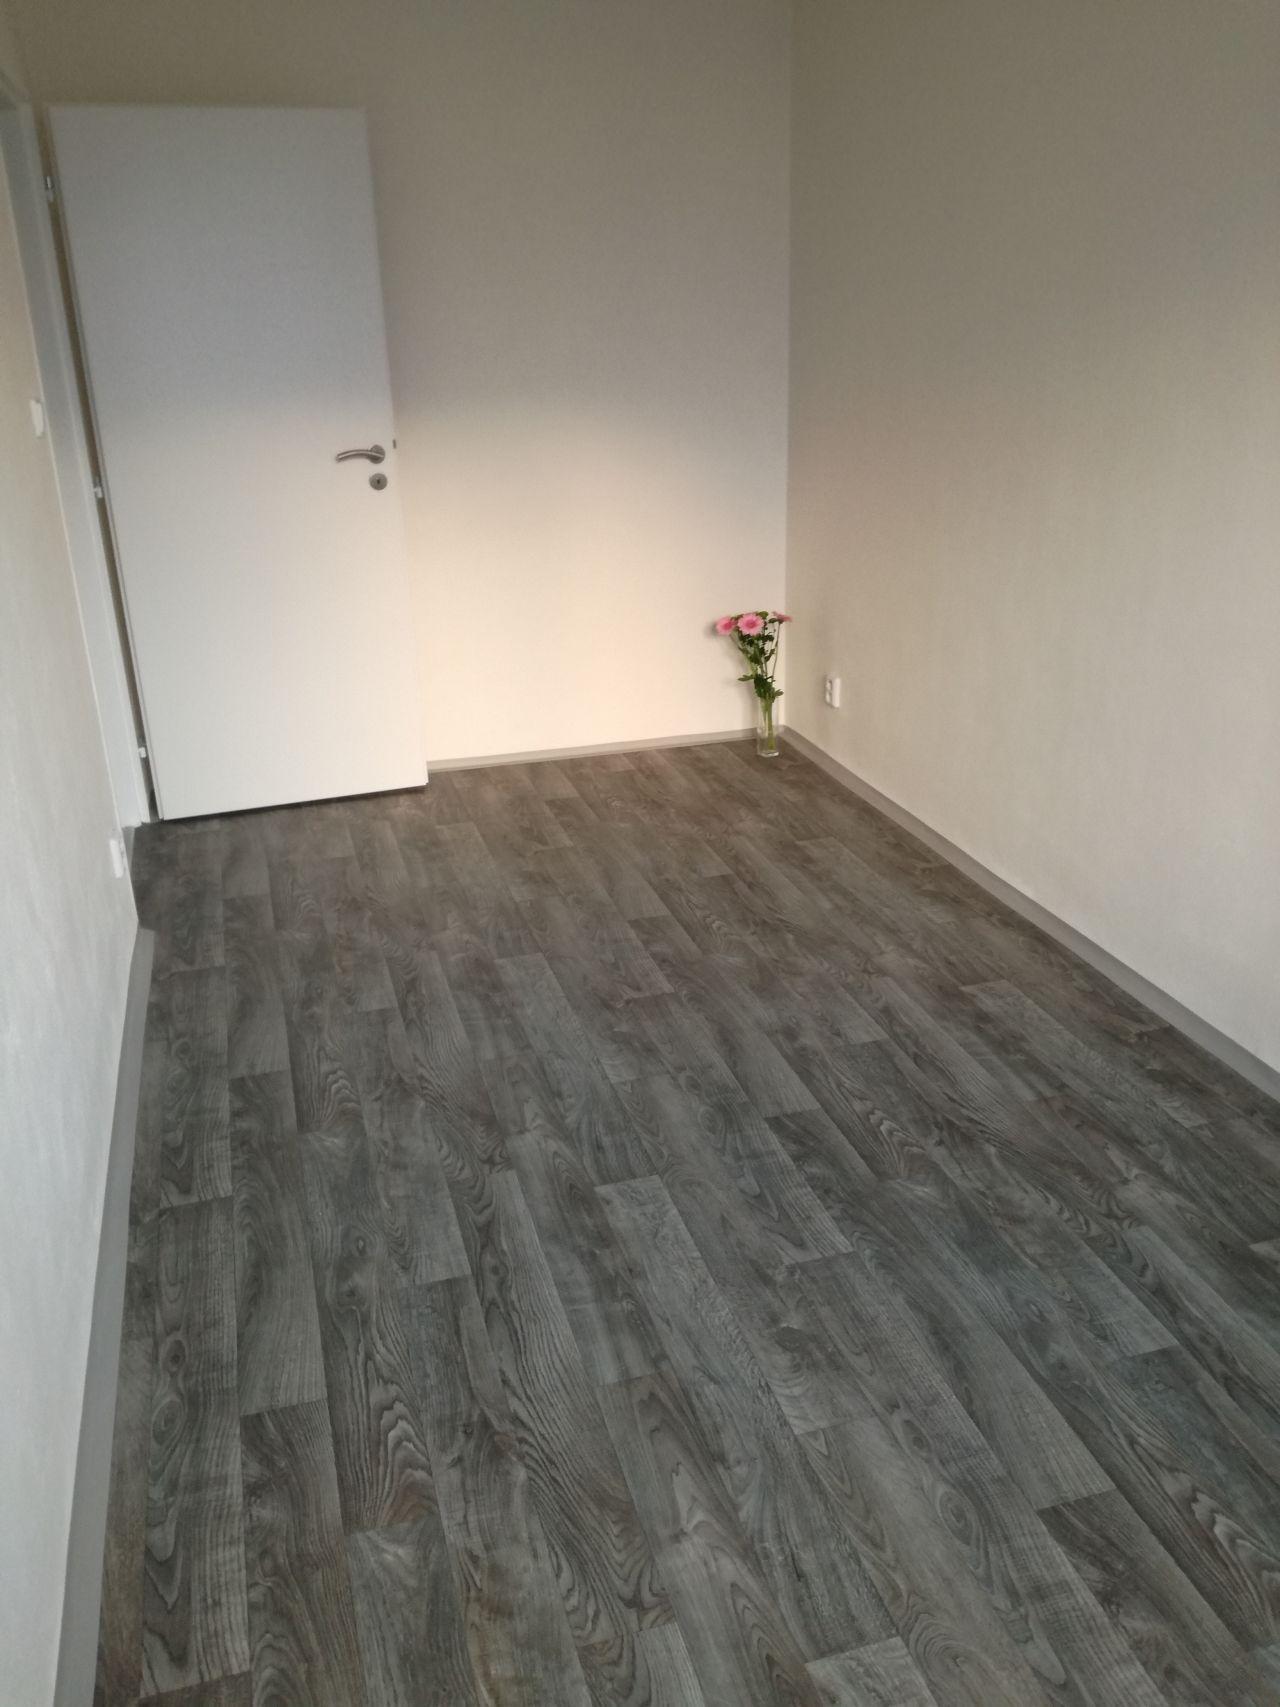 Pronájem bytu 2+1 44 m2, ul. Aloise Gavlase 37/12, Ostrava - Dubina